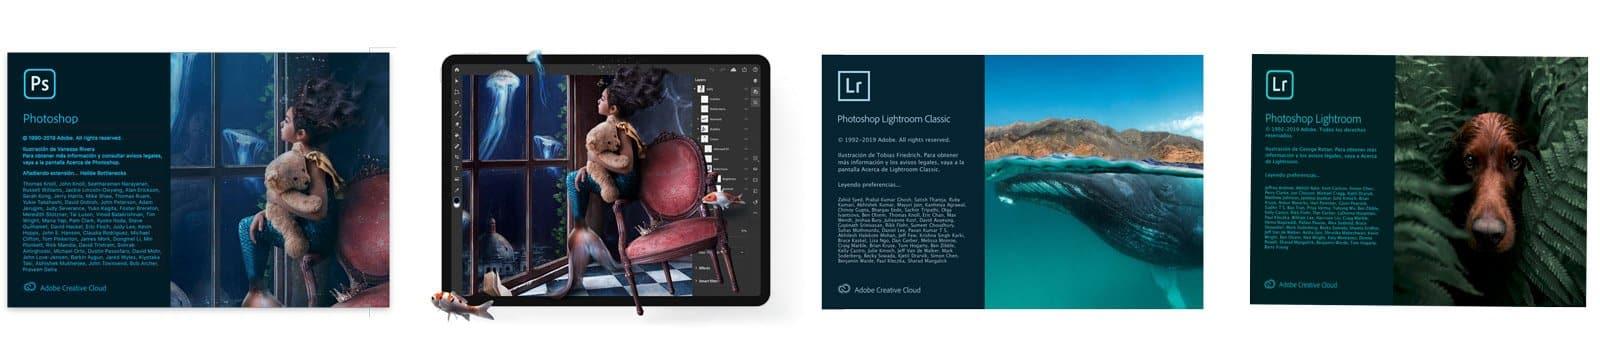 Novedades Photoshop 2020, Photoshop para iPad, Lightroom Classic 9, Lightroom 3